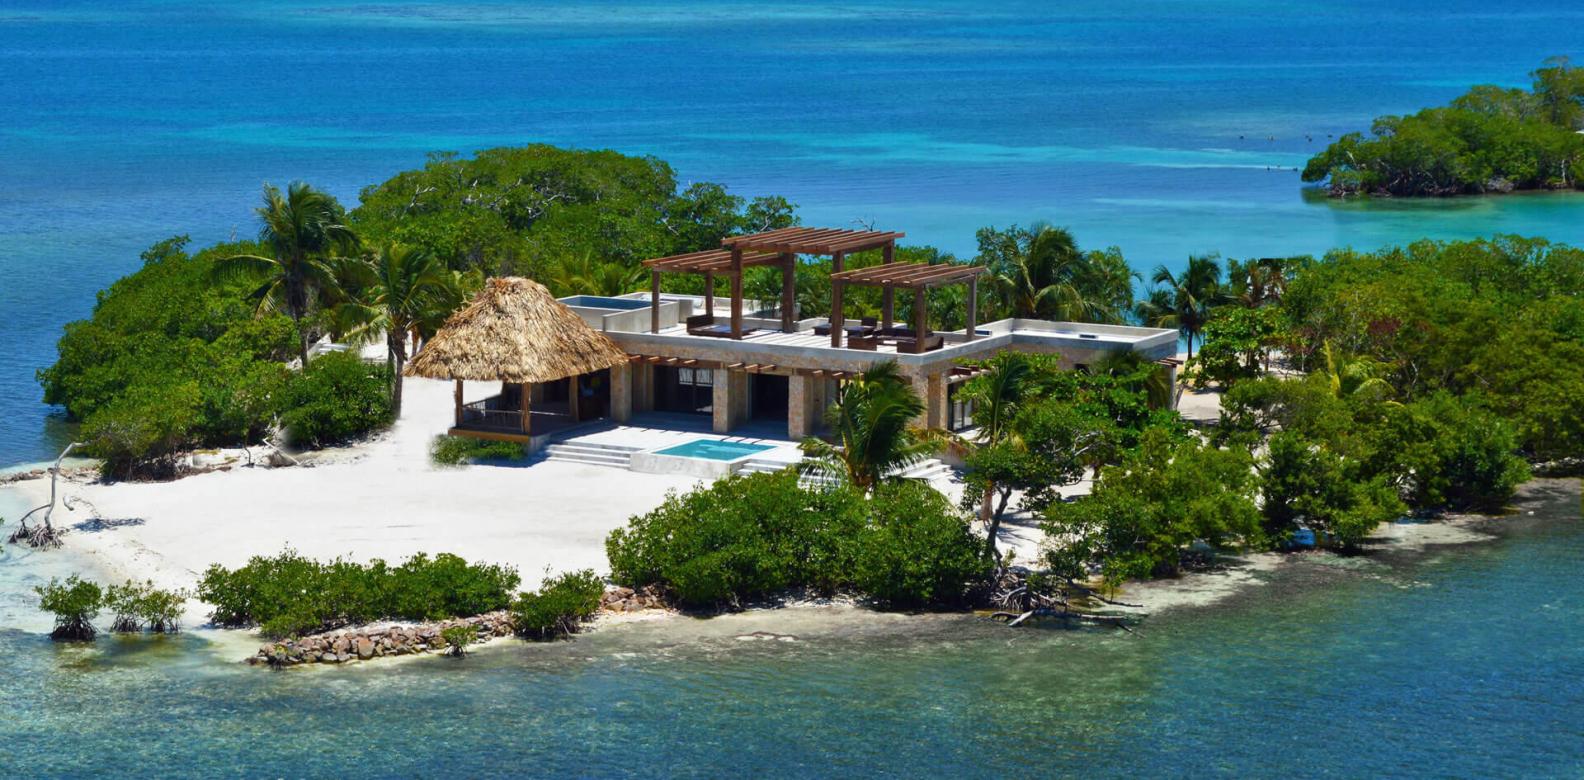 Belize Travel Reviews